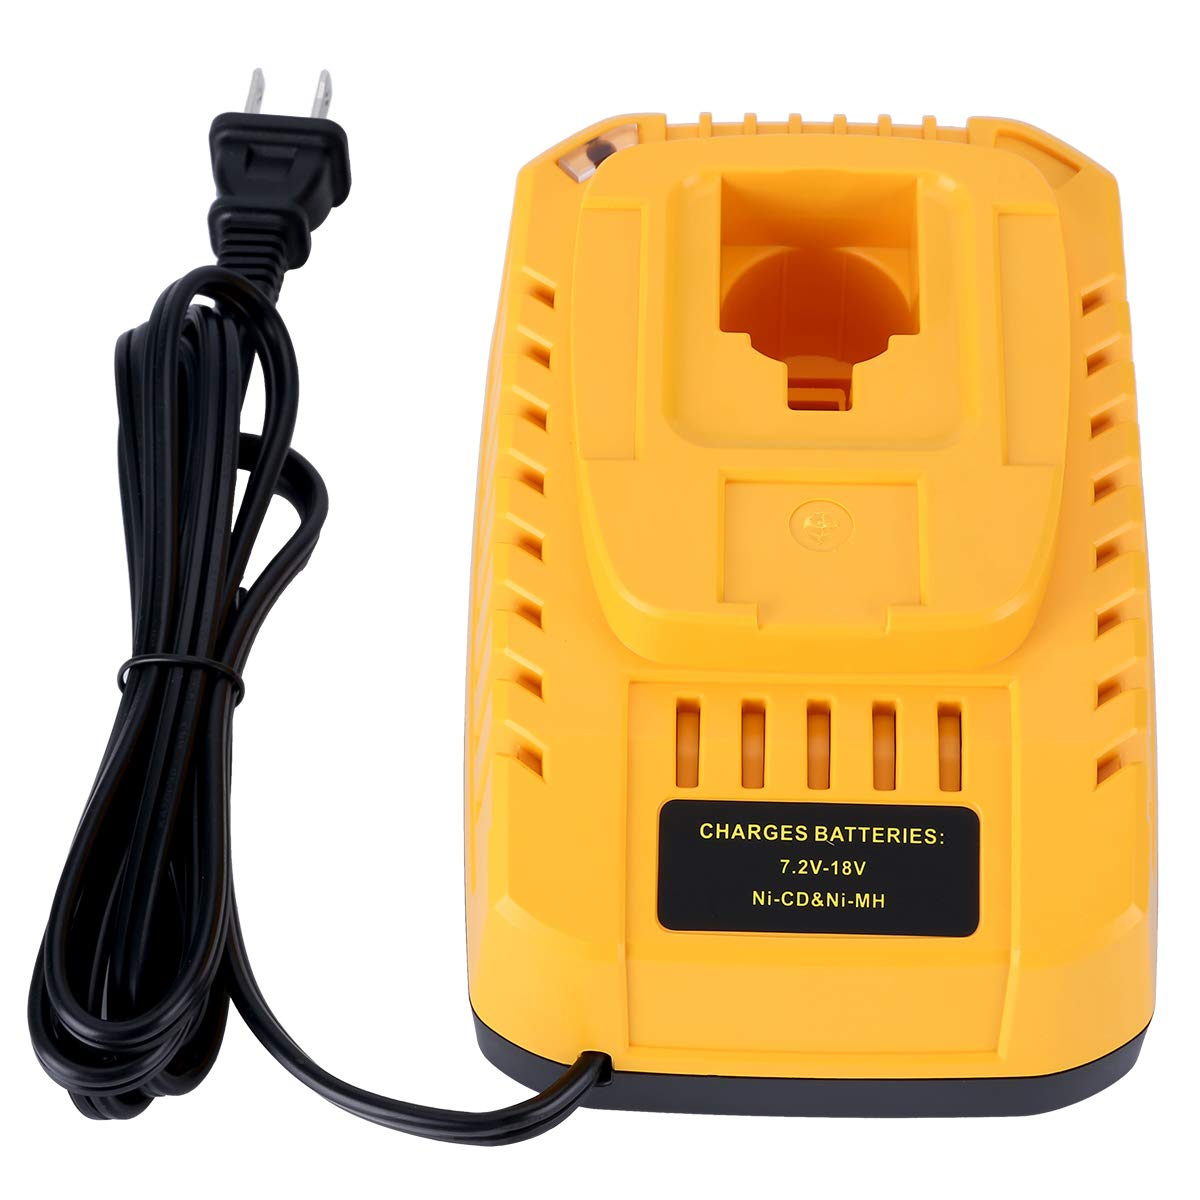 Qbmel 7.2V-18V Battery Charger for DEWALT NiCd & NiMh Battery DW9057 DC9071 DC9091 DC9096 DW9072 DW9091 DW9071